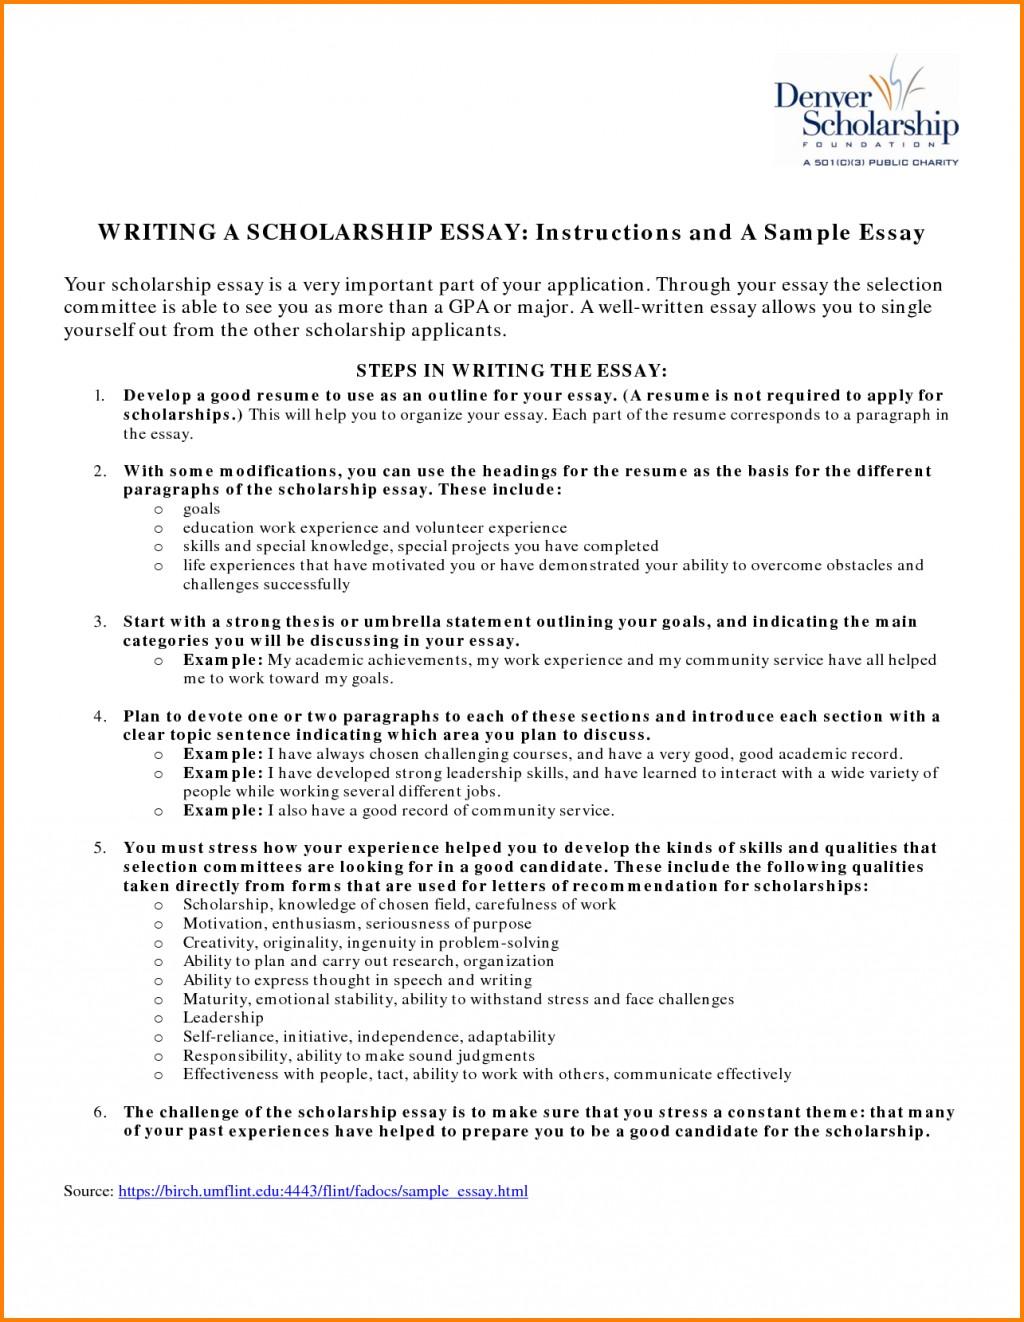 011 Fair Resumes For Scholarships In Scholarship Essay Sample Of Incredible Mara Personal Pdf Large